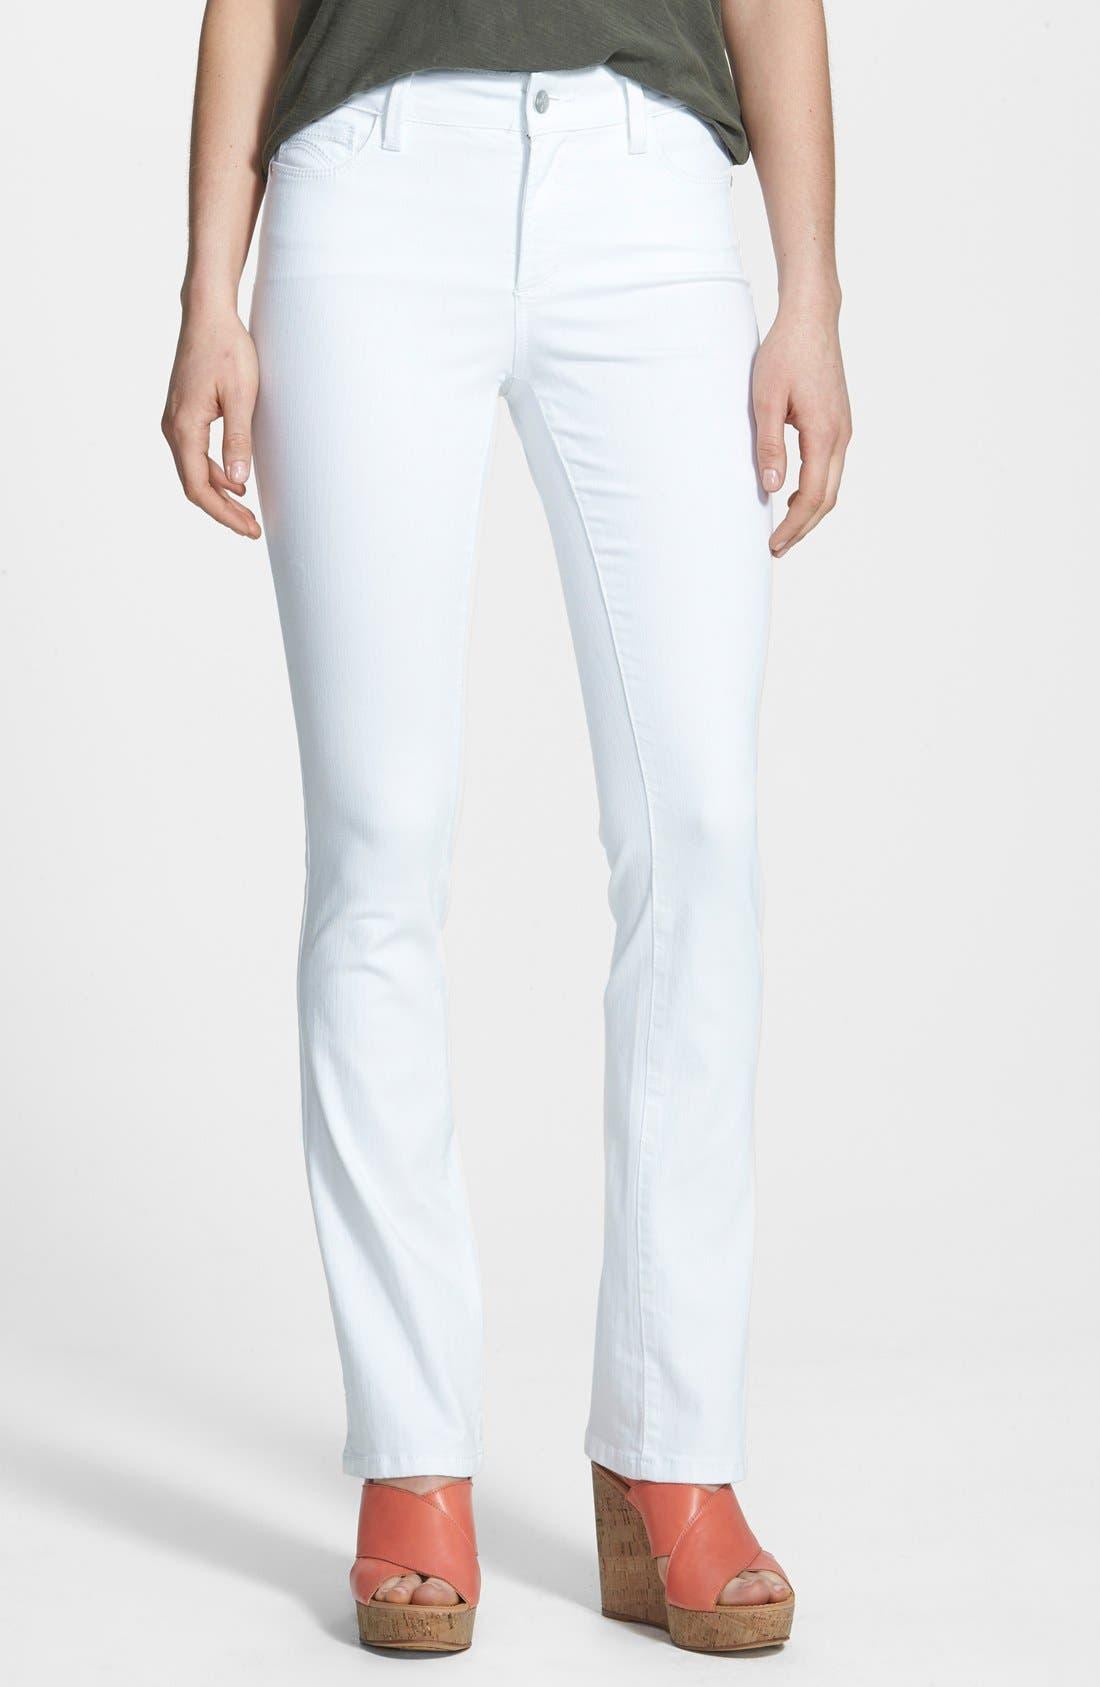 'Billie' Stretch Mini Bootcut Jeans,                             Main thumbnail 1, color,                             103